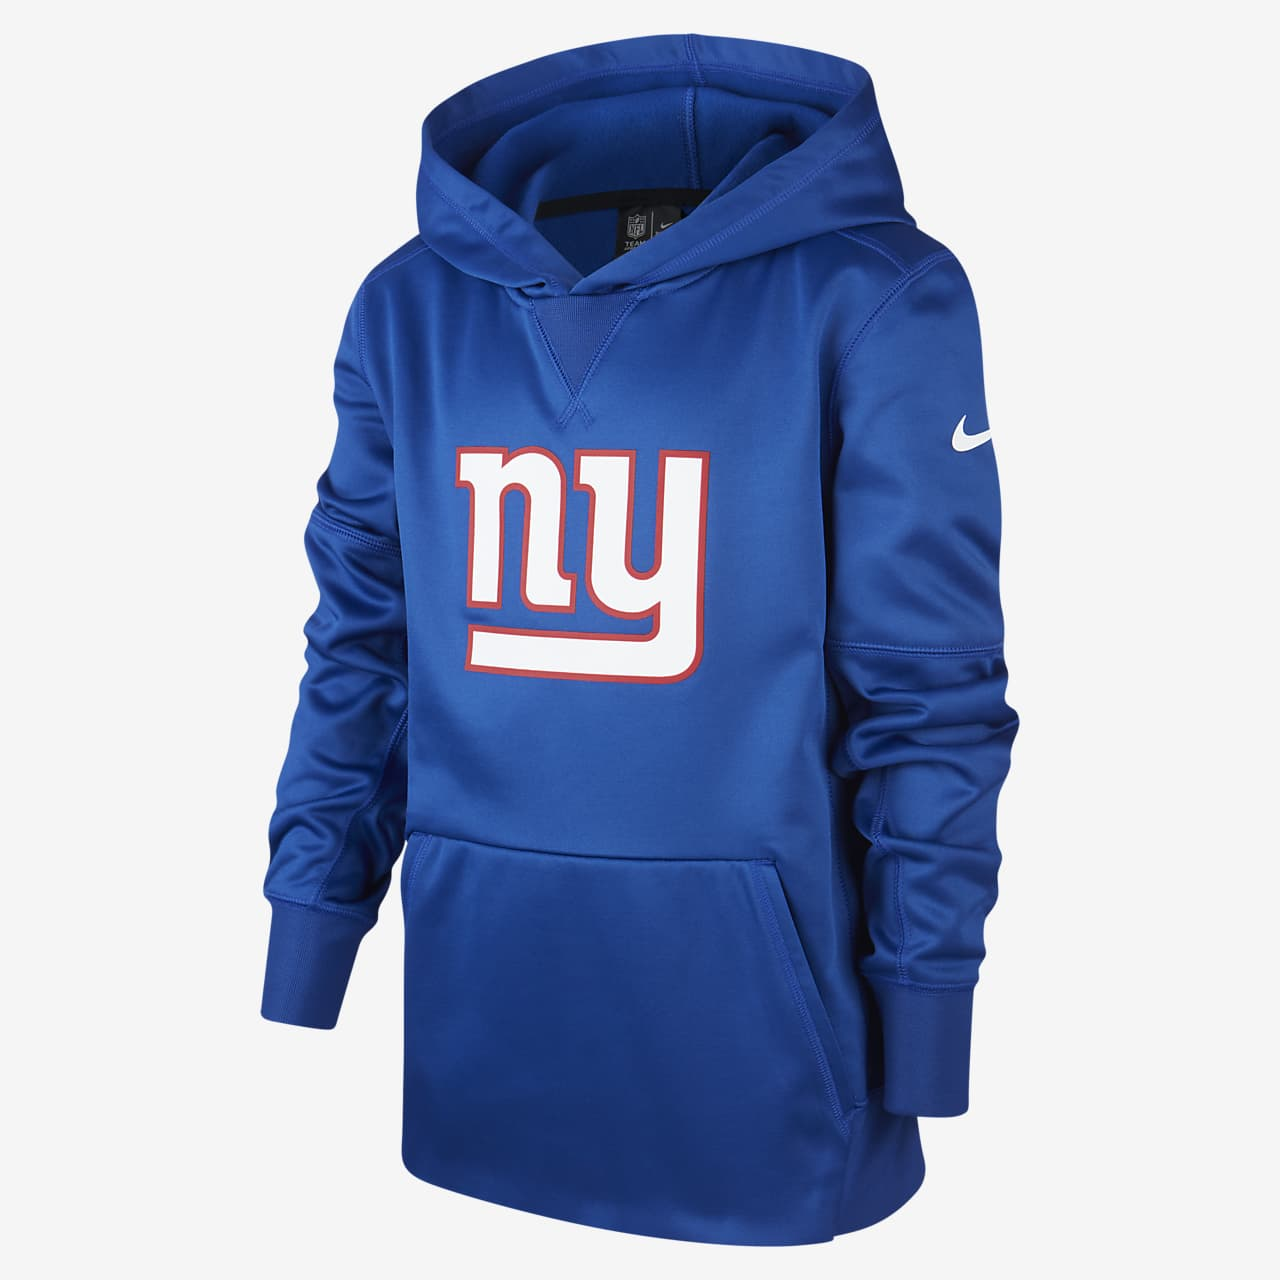 enviar Medición transportar  Nike (NFL Giants) Sudadera con capucha - Niño/a. Nike ES